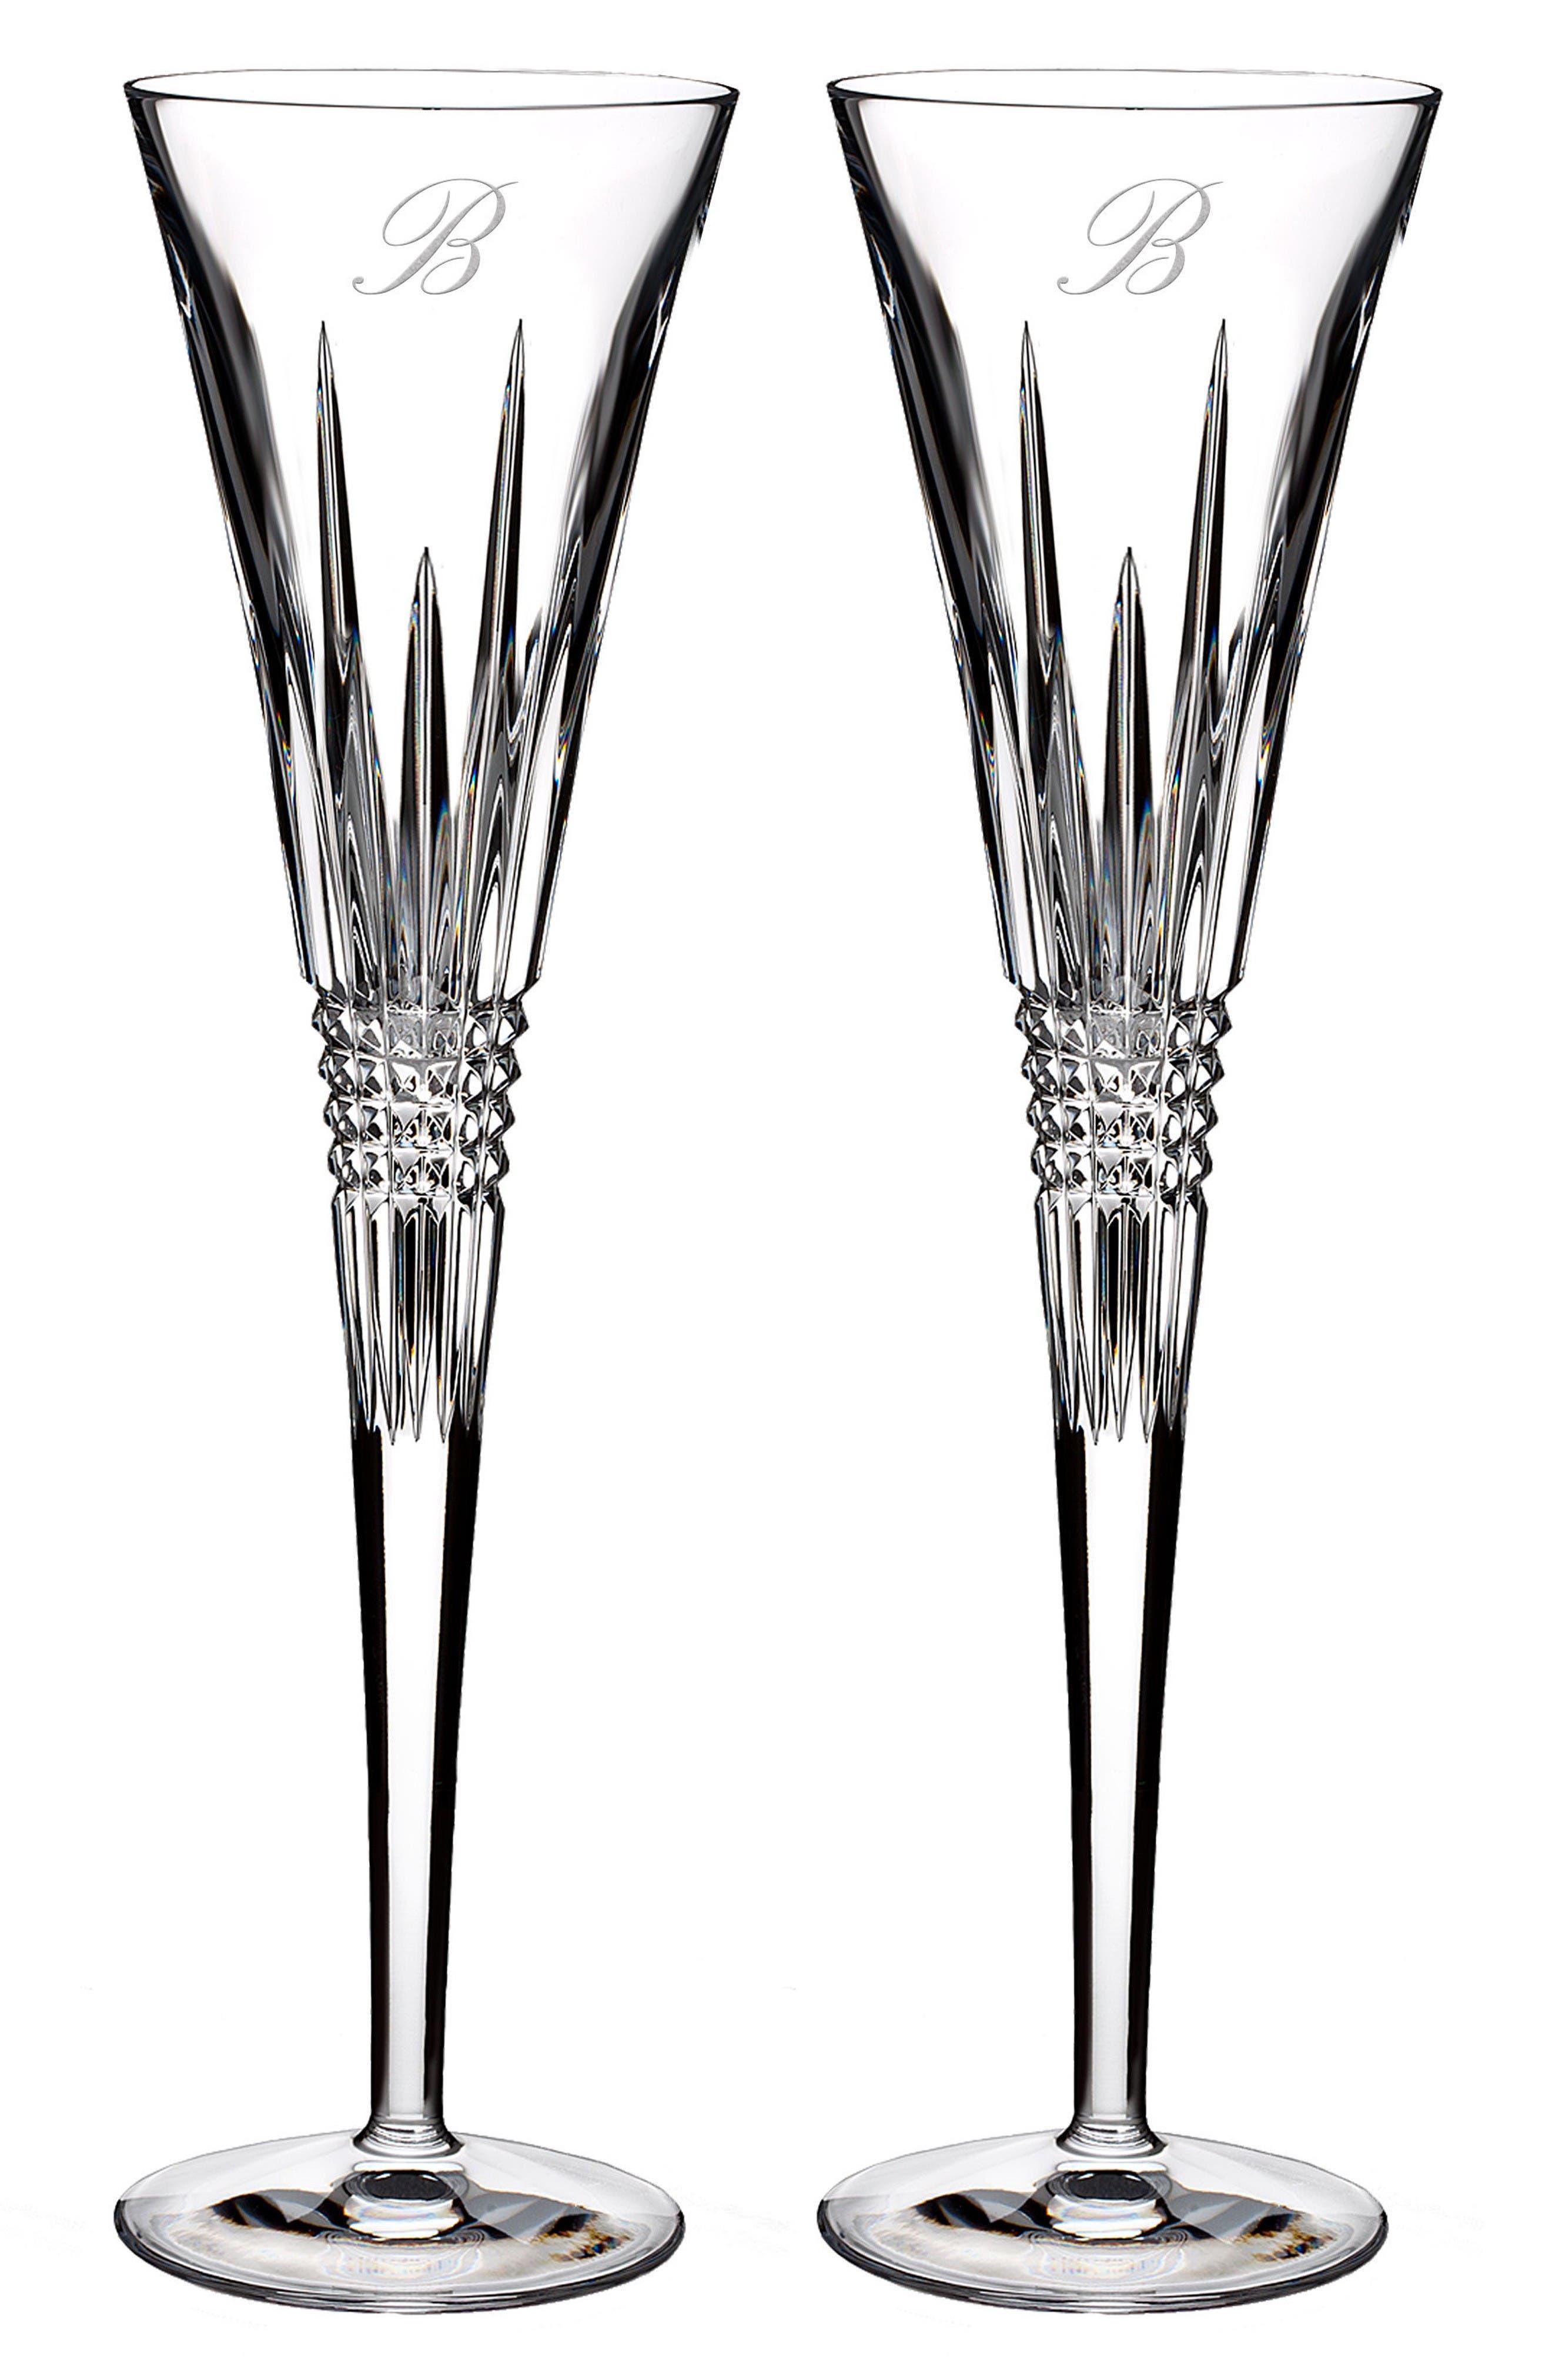 Alternate Image 1 Selected - Waterford Lismore Diamond Set of 2 Monogram Lead Crystal Champagne Flutes